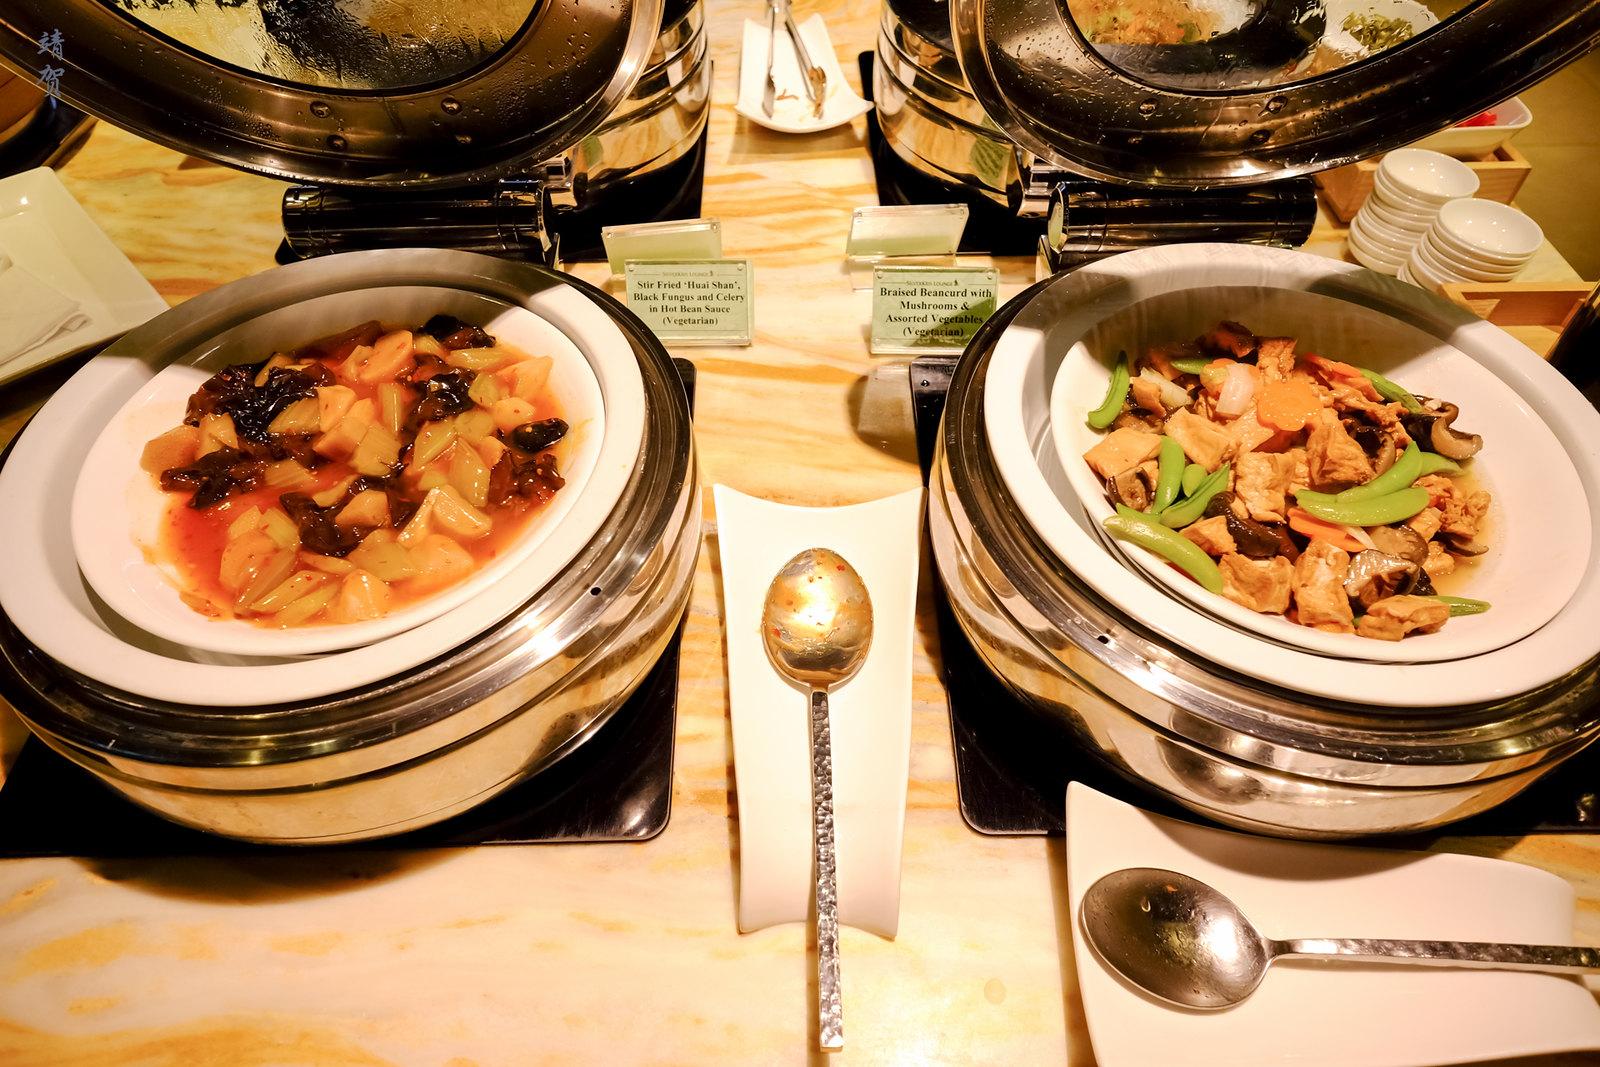 Stir fried black fungus and braised beancurd